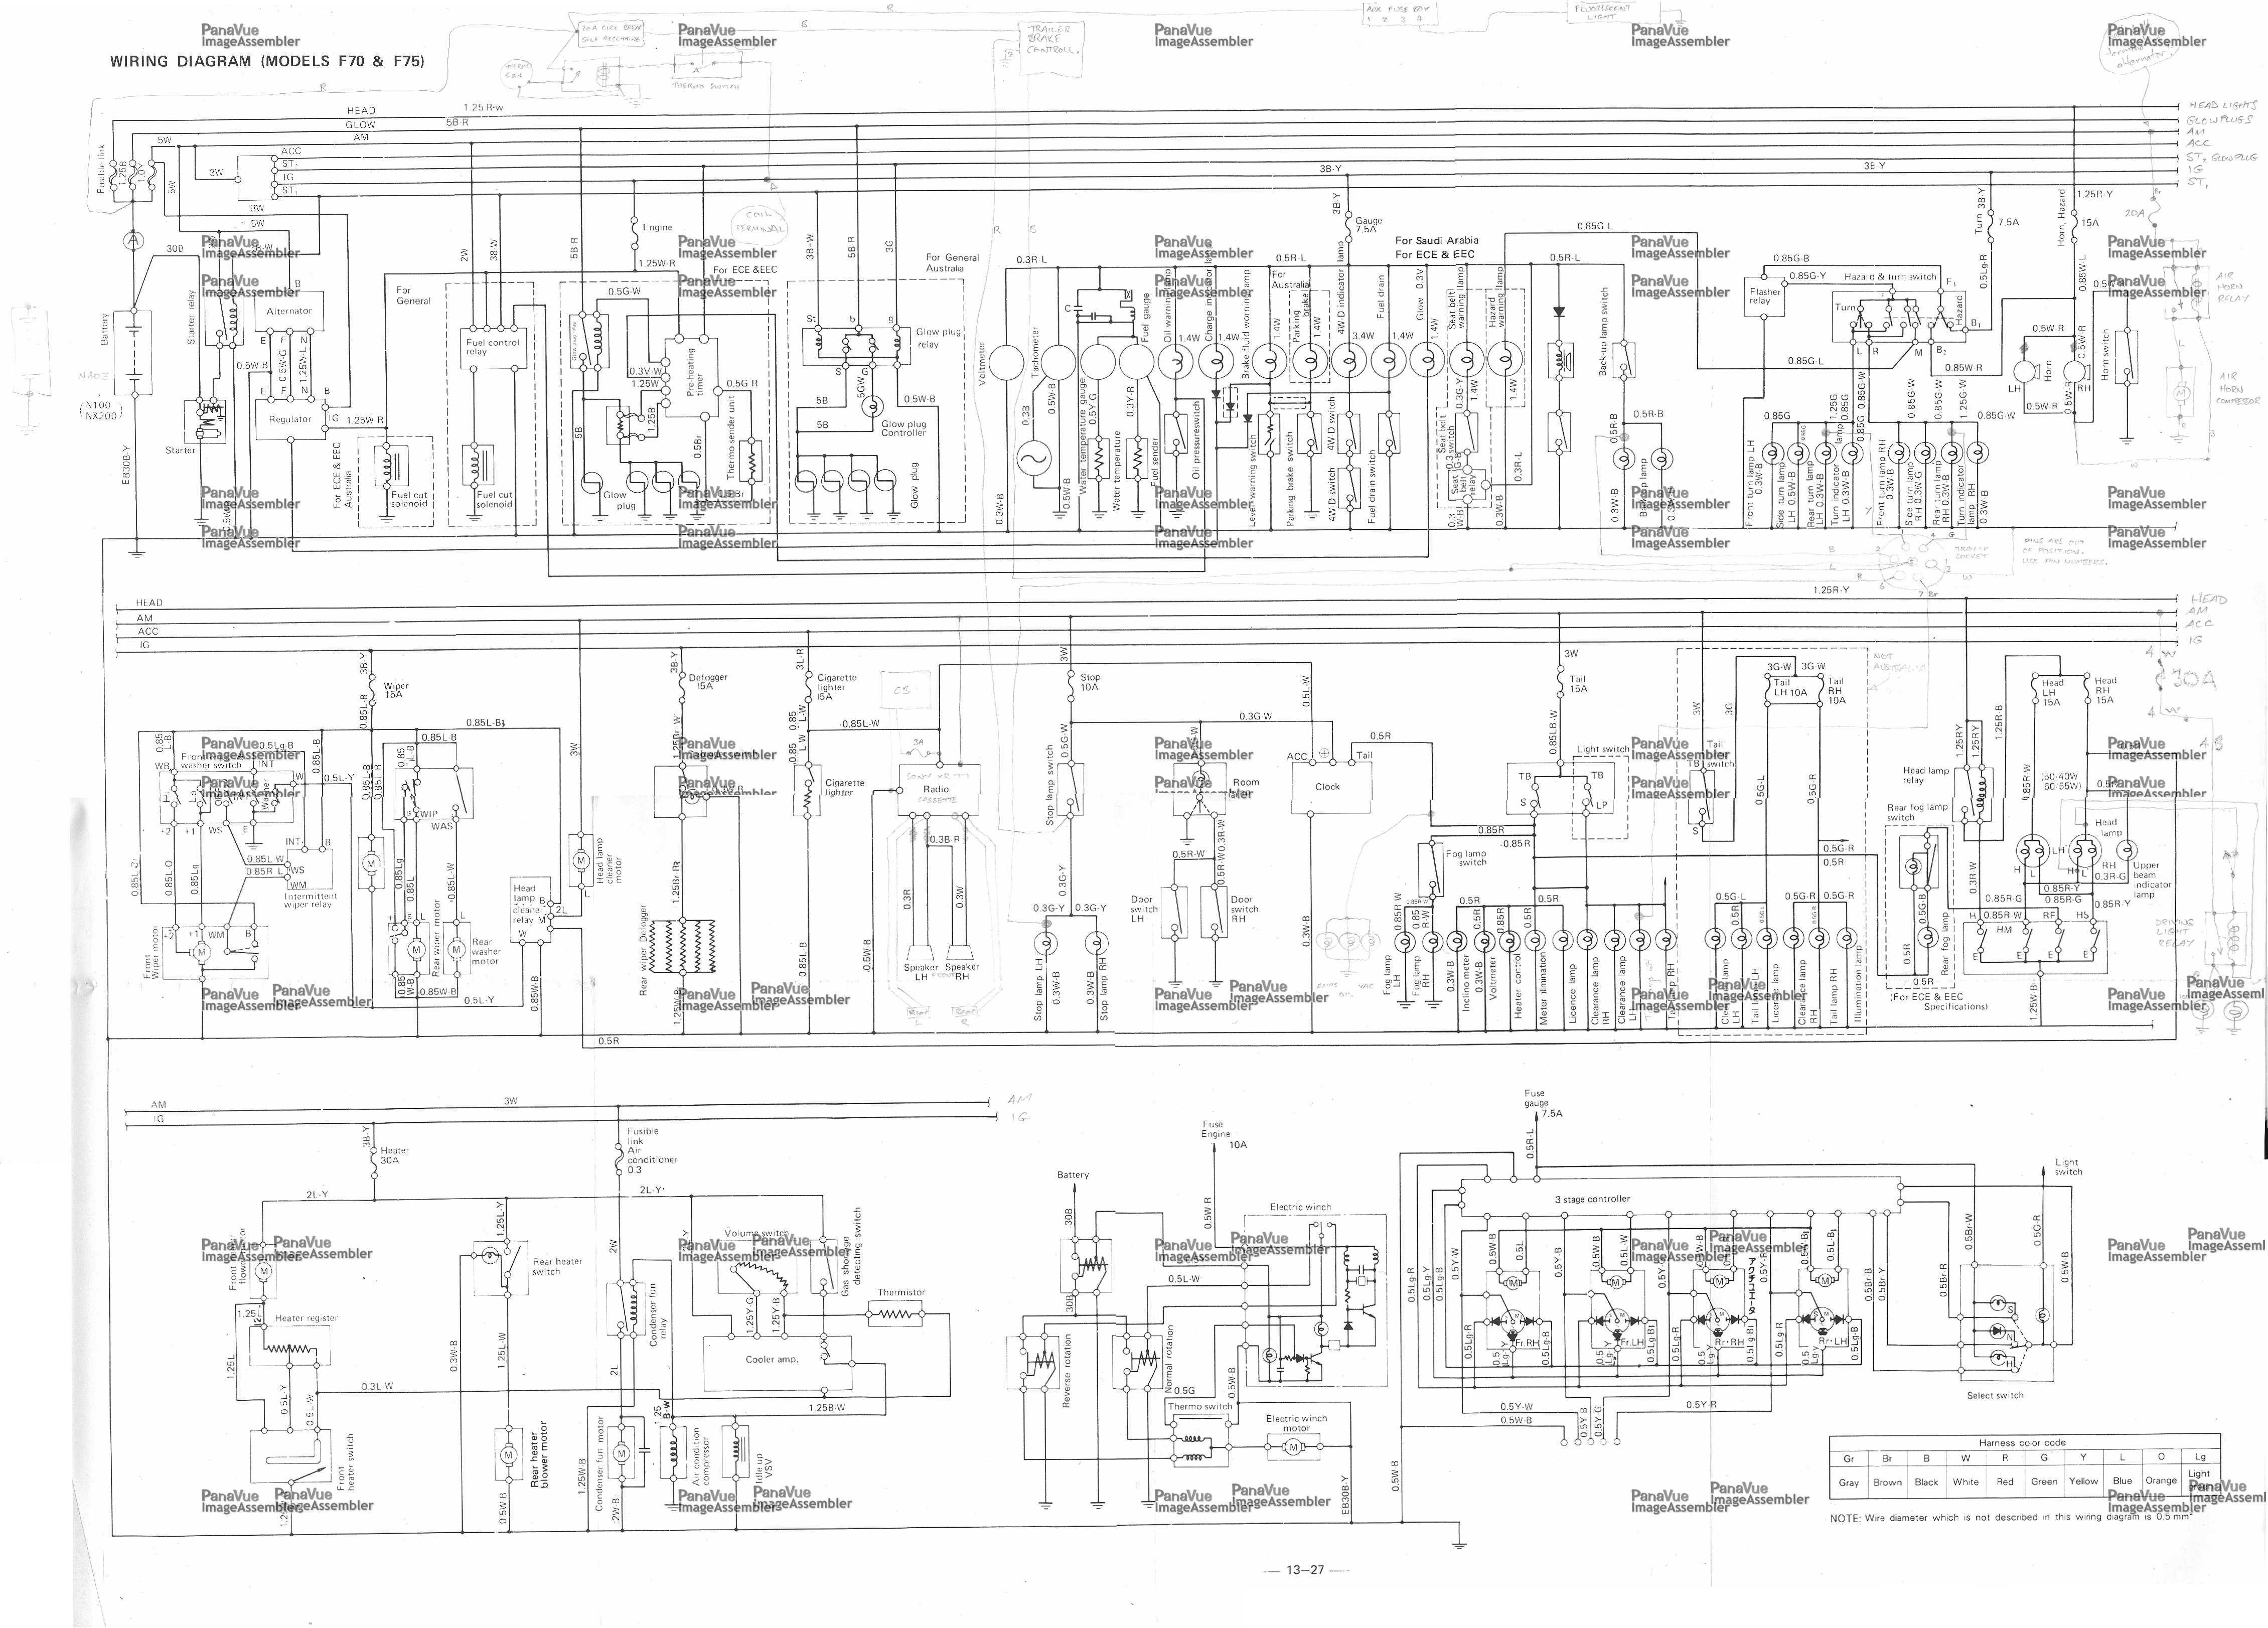 Mazda 121 Fuse Box Diagram - Electrical Work Wiring Diagram •